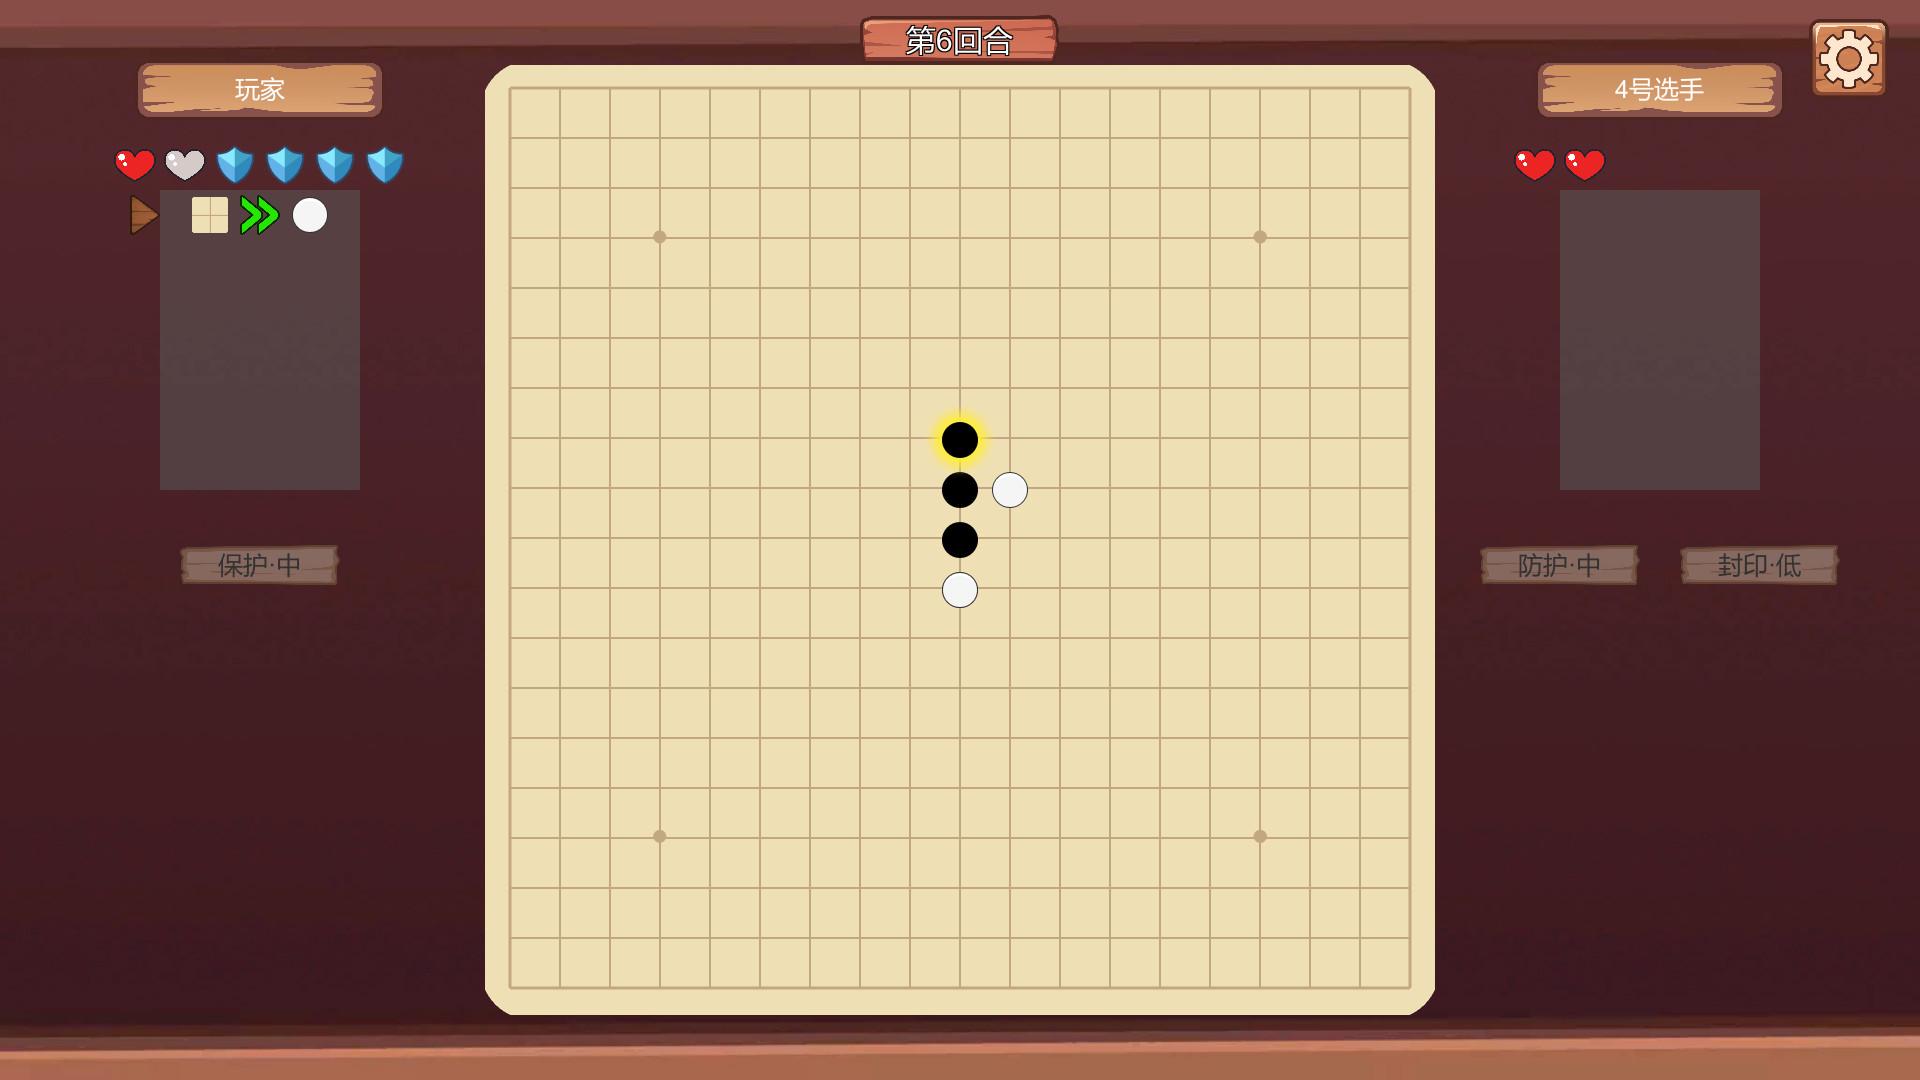 Super Gobang screenshot